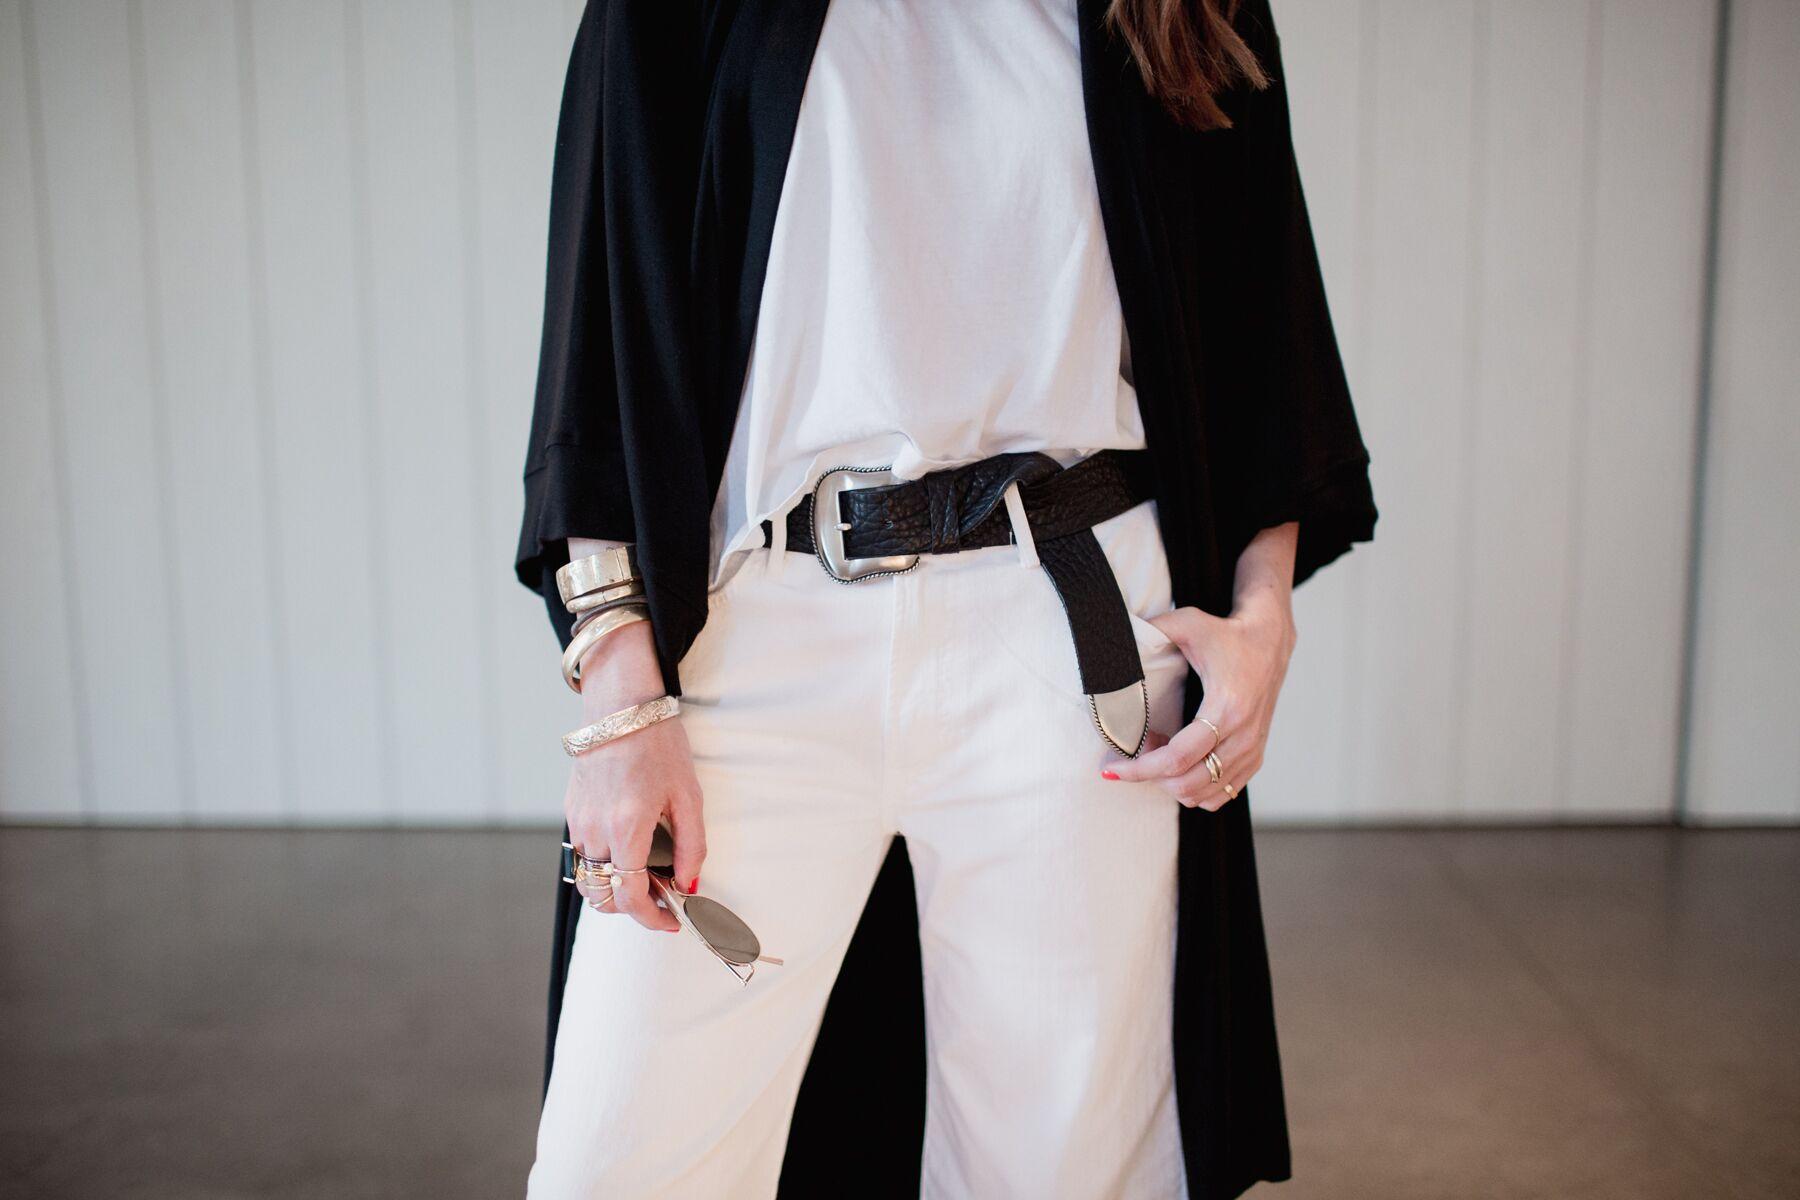 eldridge_edit_anna_e_cottrell_fashion_blogger_black_and_white_shop_lola_boutique_mgb_photo_mother_white_jean_b_low_the_belt_dita_freebird_sunglasses_joie_cognac_mules_vintage_bracelets_1.JPG